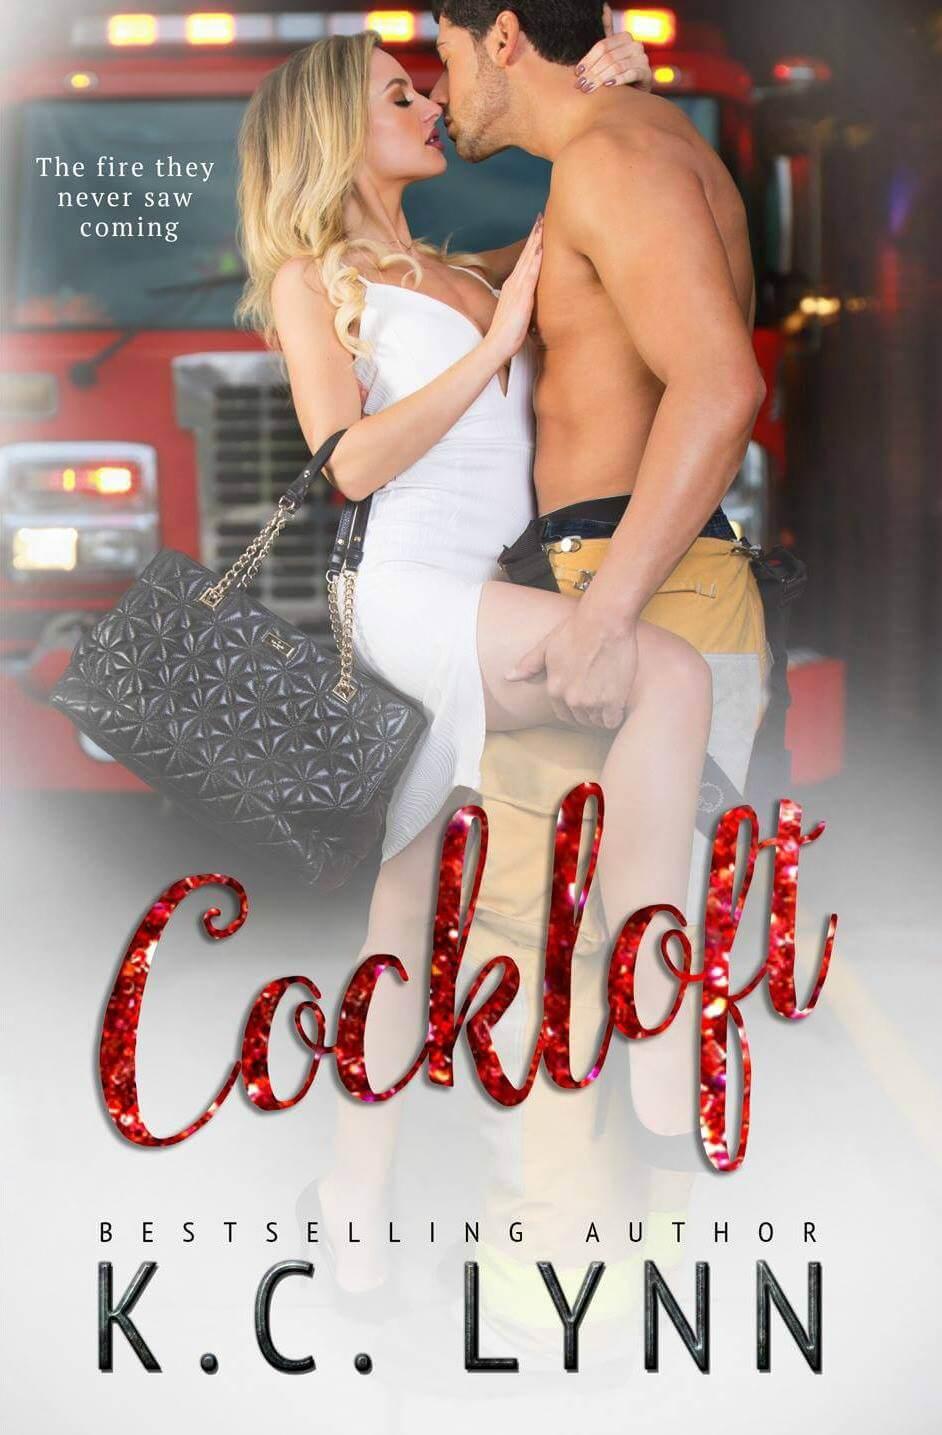 Cockloft by KC Lynn: New Release